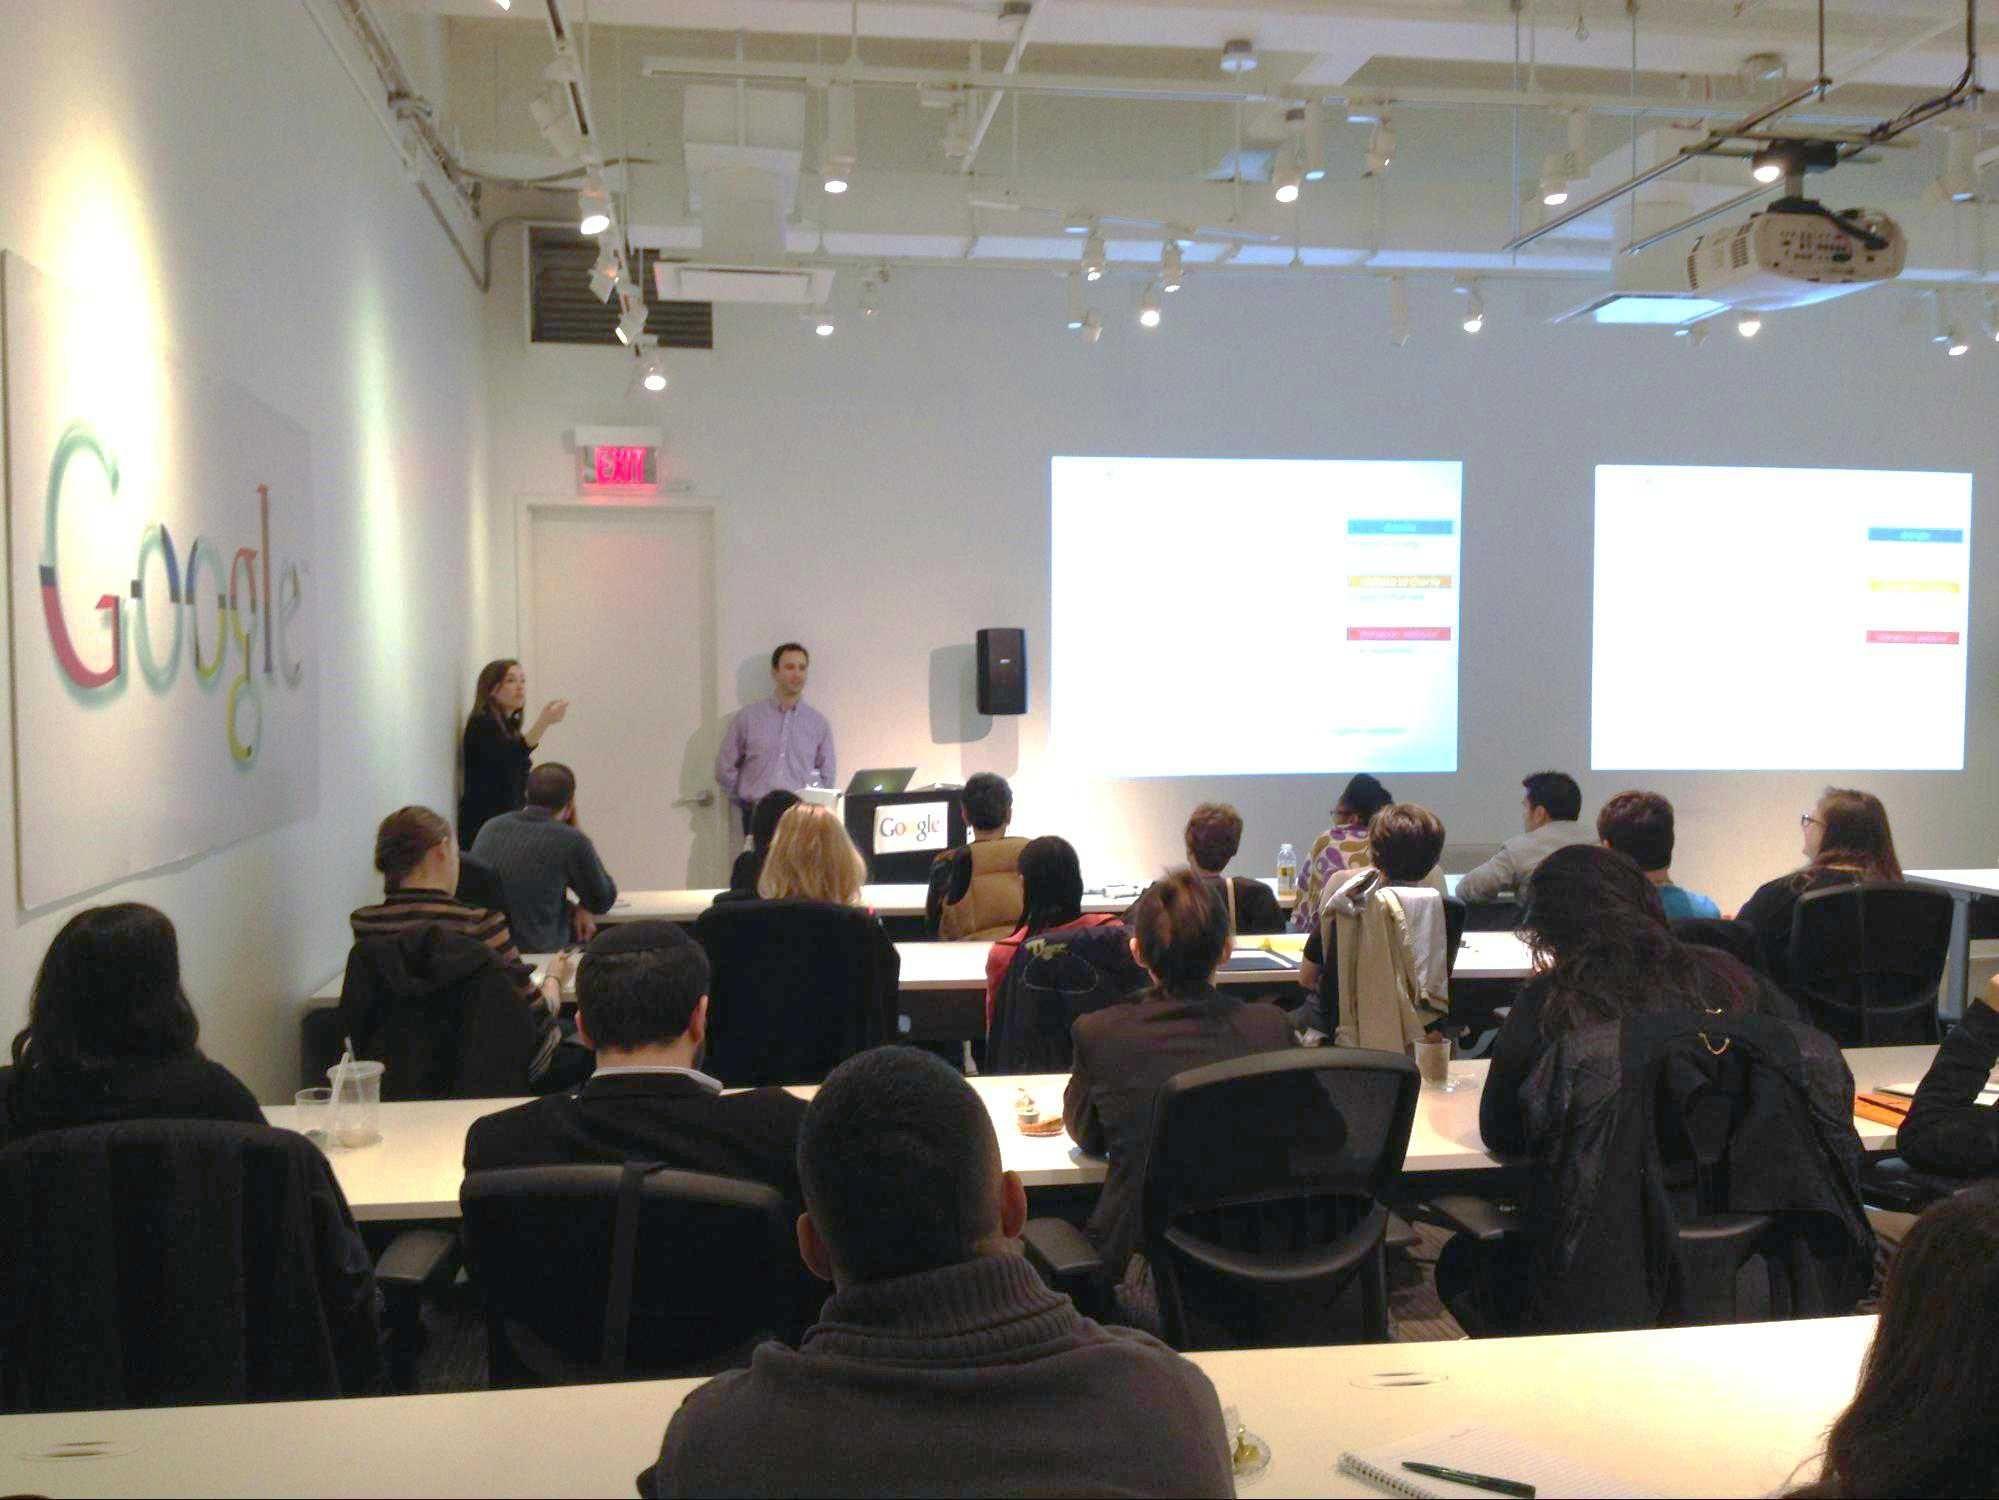 Imaginative google nyc office google nyc office training for Training room design ideas